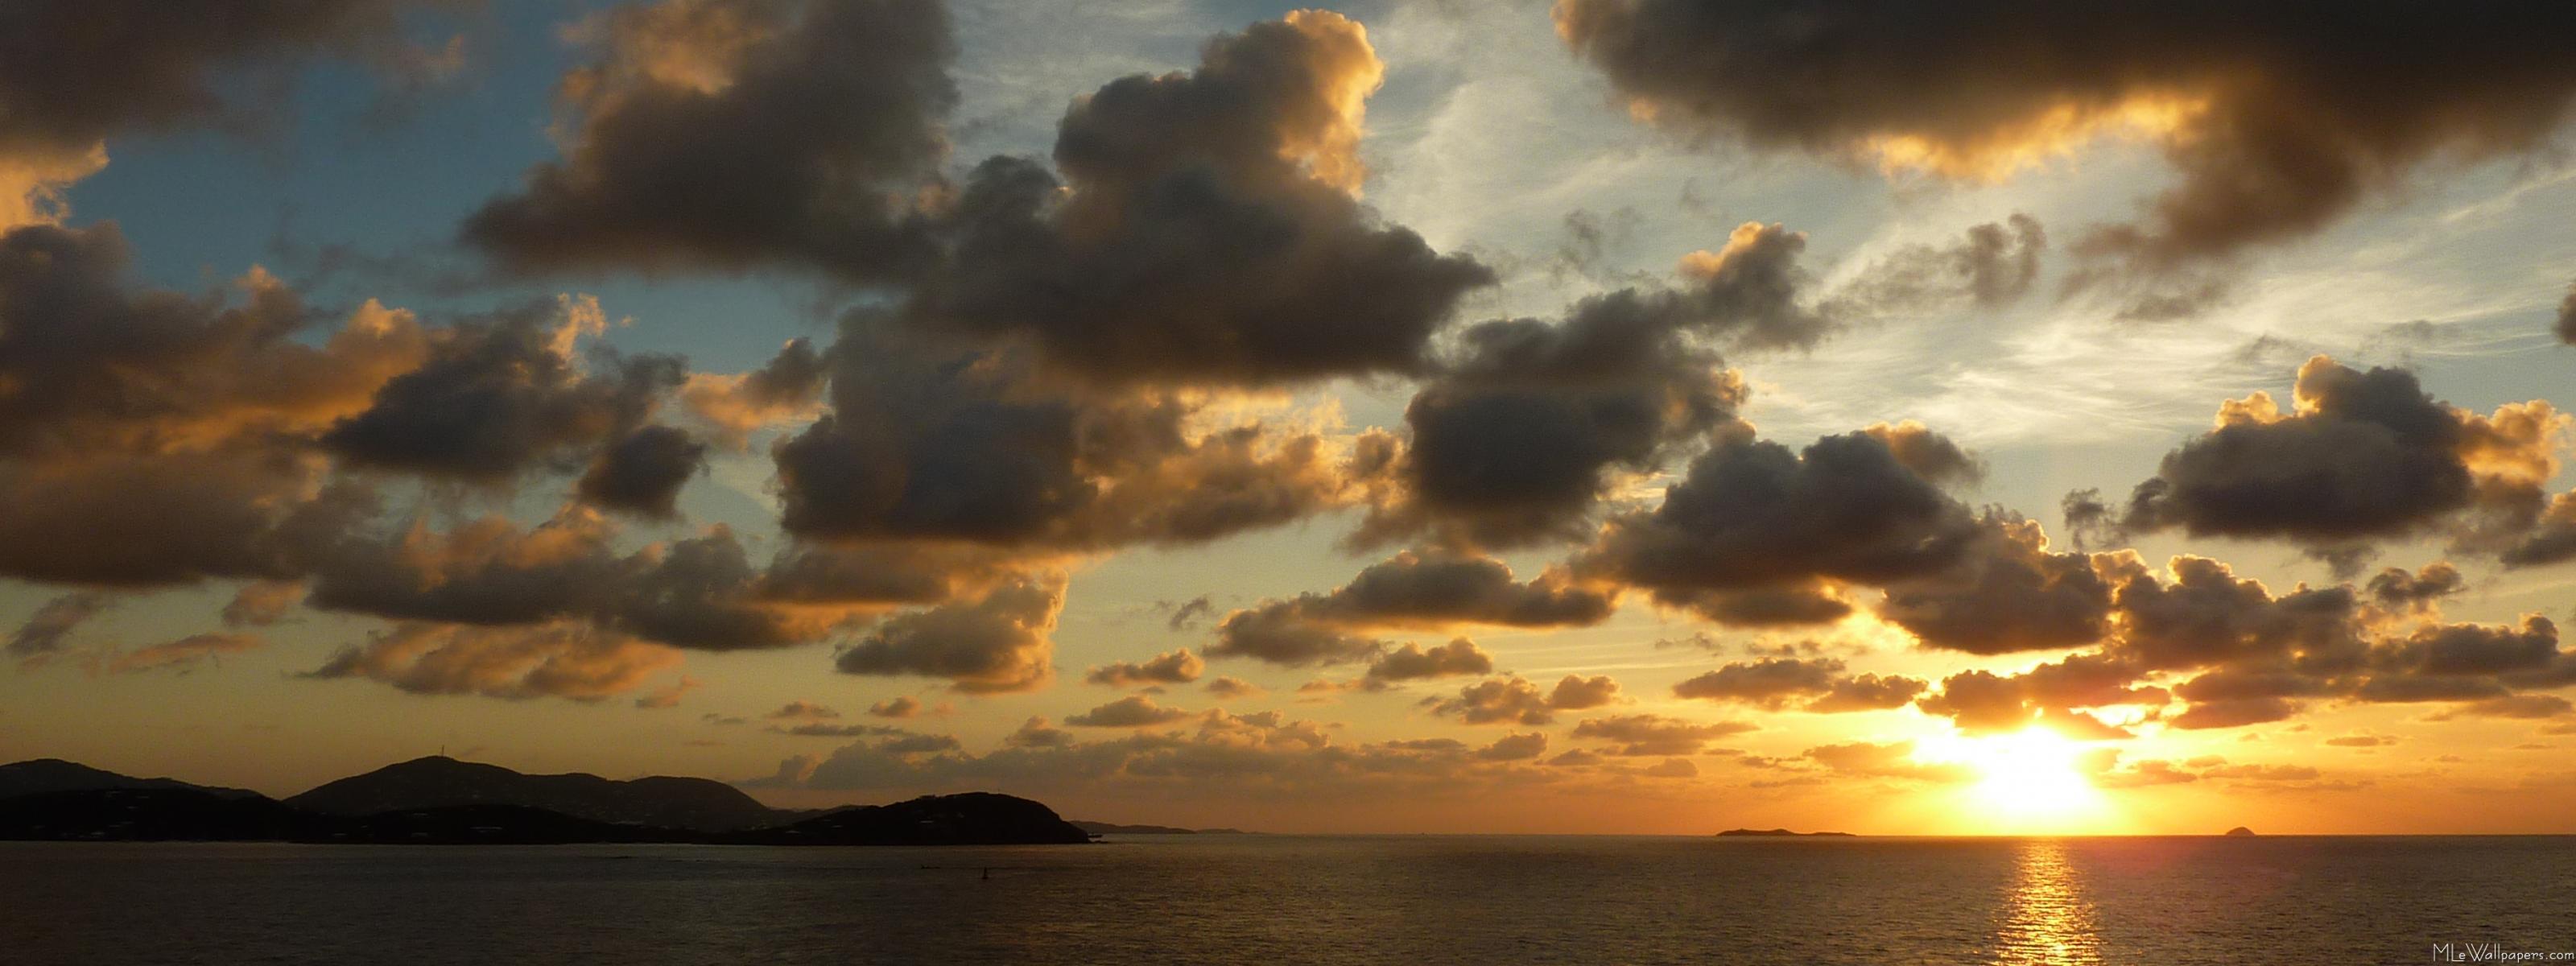 Cruise The Virgin Islands December 2010